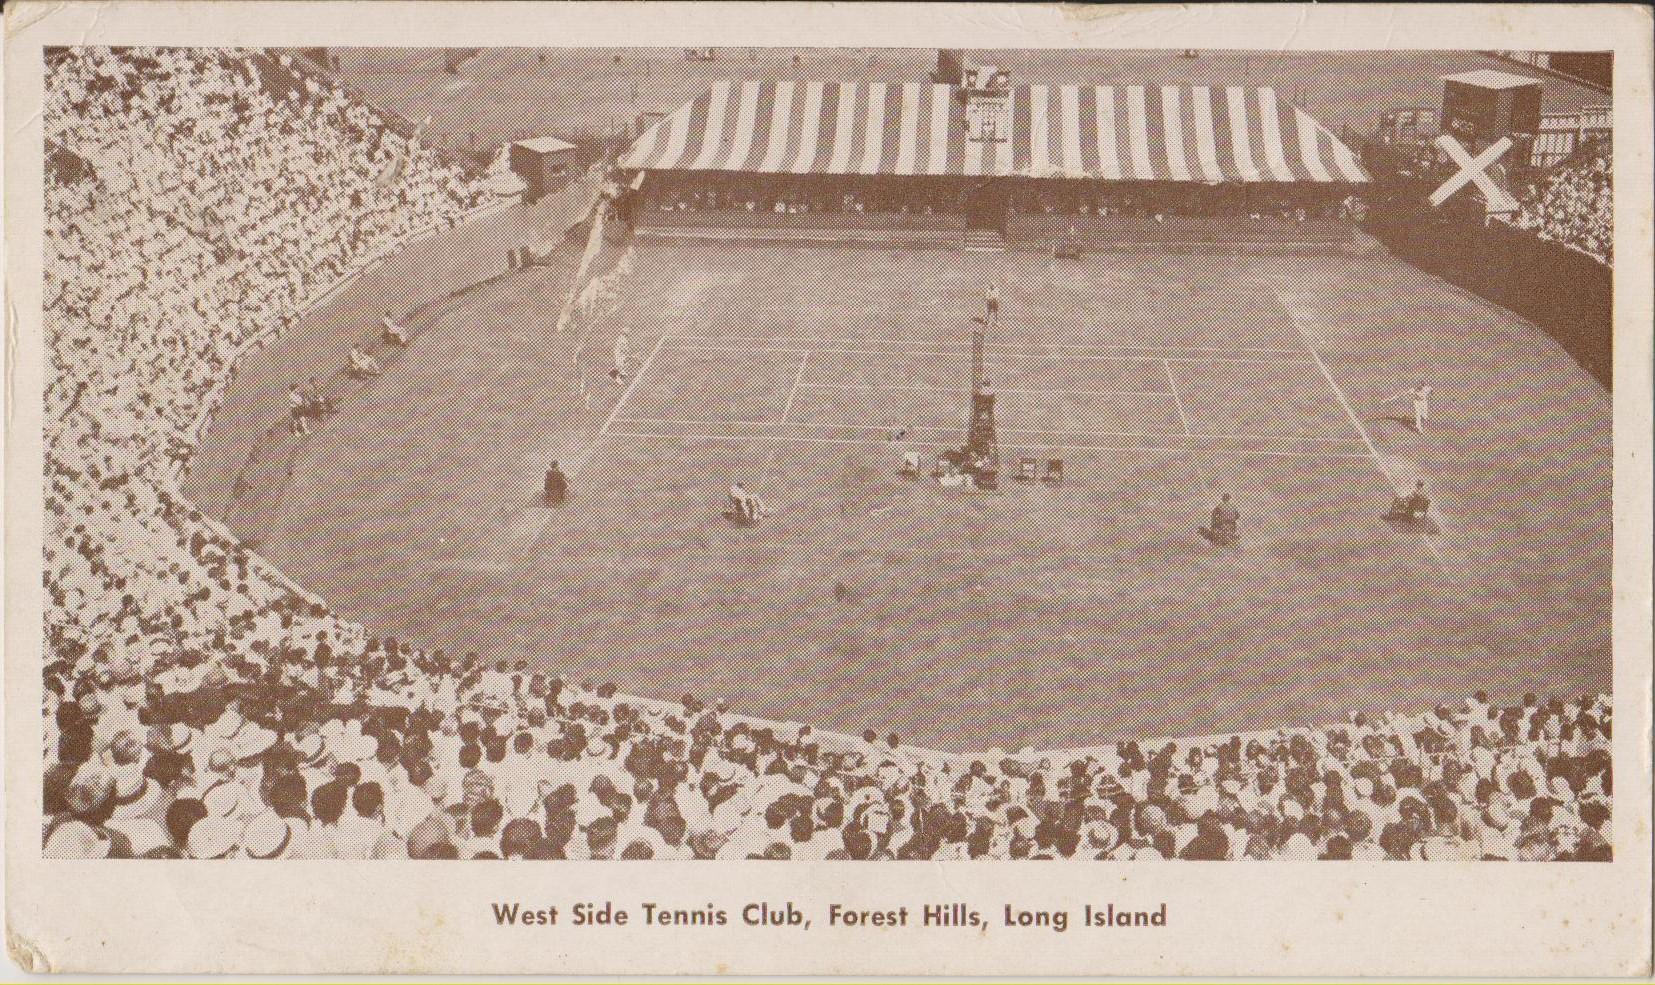 US Open 1948- My Dad's blog post